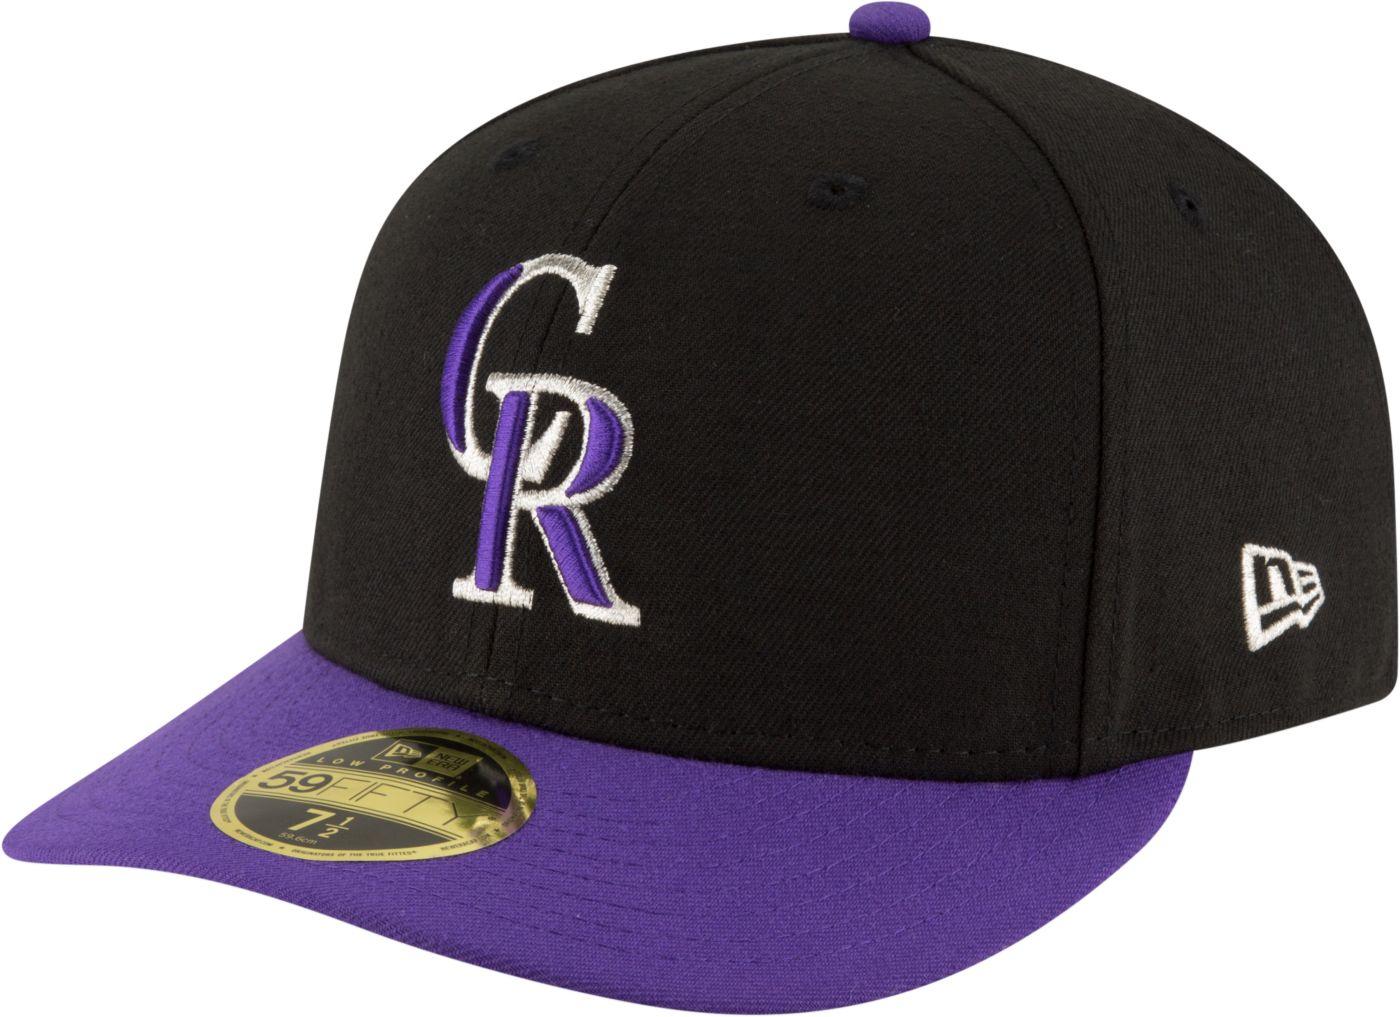 New Era Men's Colorado Rockies 59Fifty Alternate Black Low Crown Authentic Hat